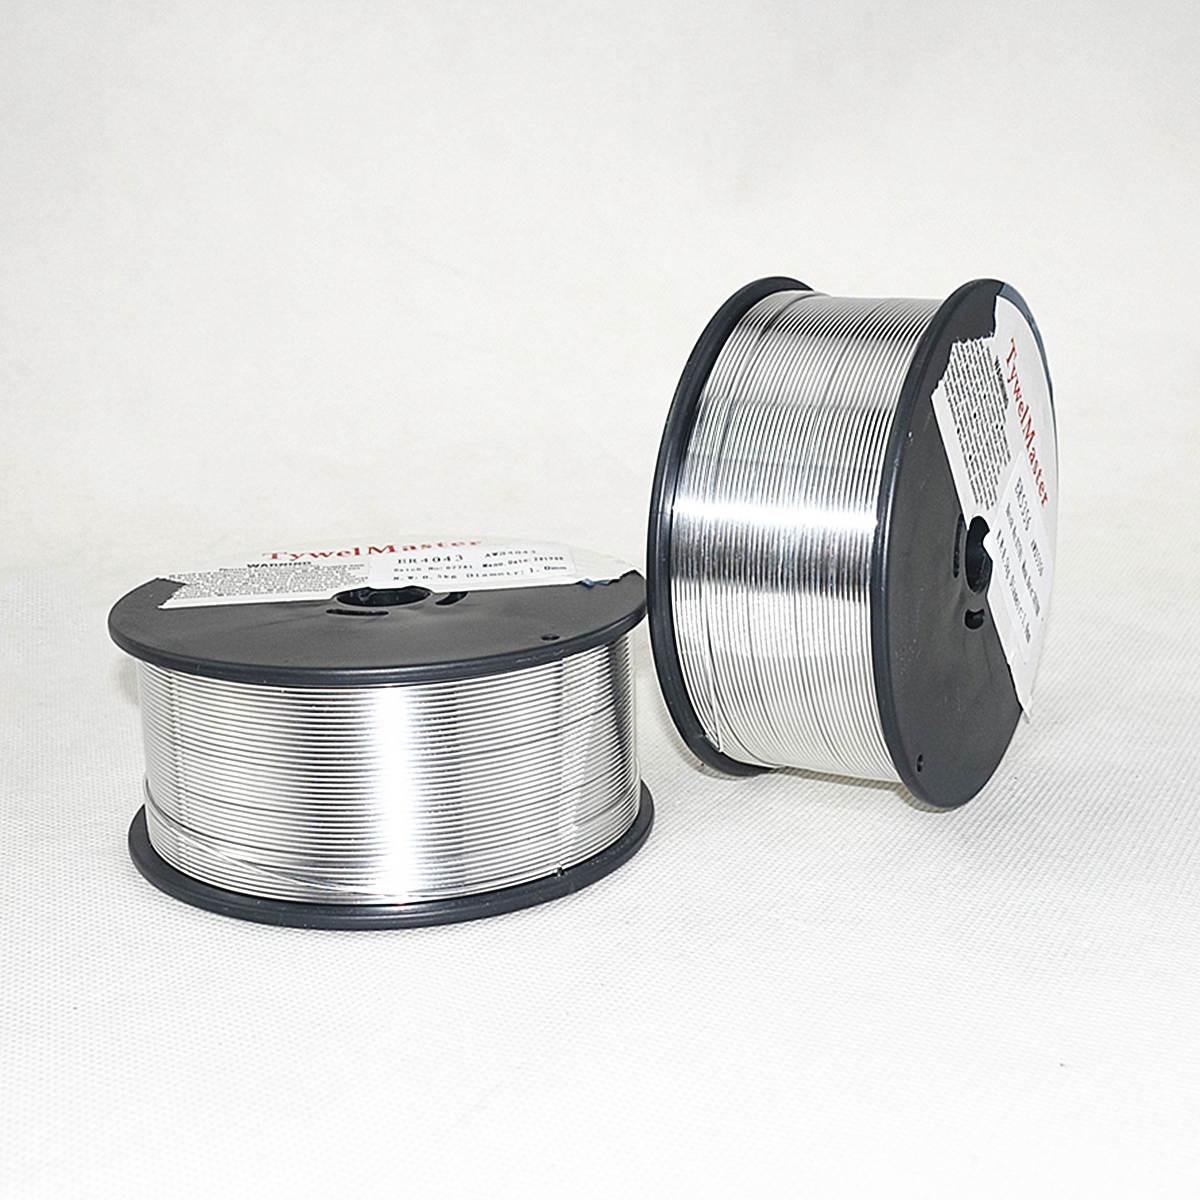 ER5356 Aluminum MIG Welding Wire SAL5356 Al-Mg Alloy 0.5KG Dia 0.8/1.0/1.2mm TIG MIG Welding Aluminum Welding Wire